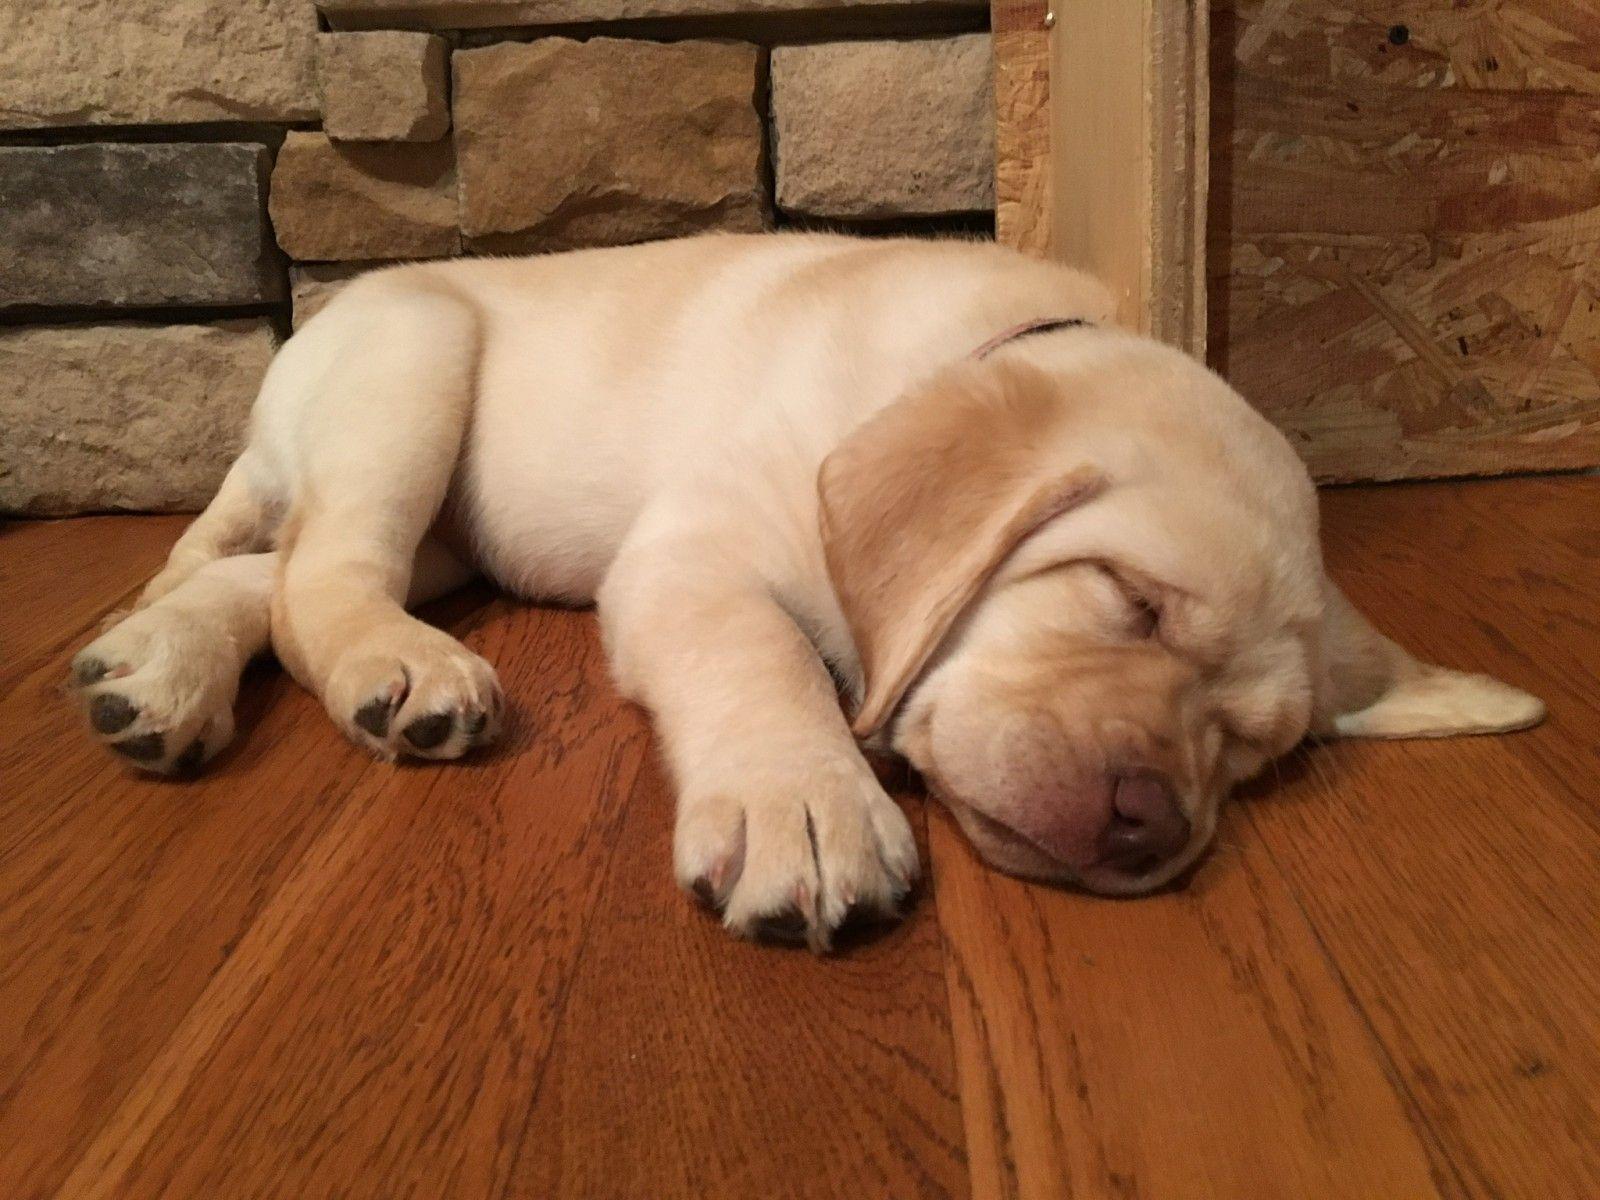 Labrador Retriever Puppies For Sale Cincinnati Oh Labradorpuppies Labradorretriever Labrador Retriever Labrador Retriever Puppies Labrador